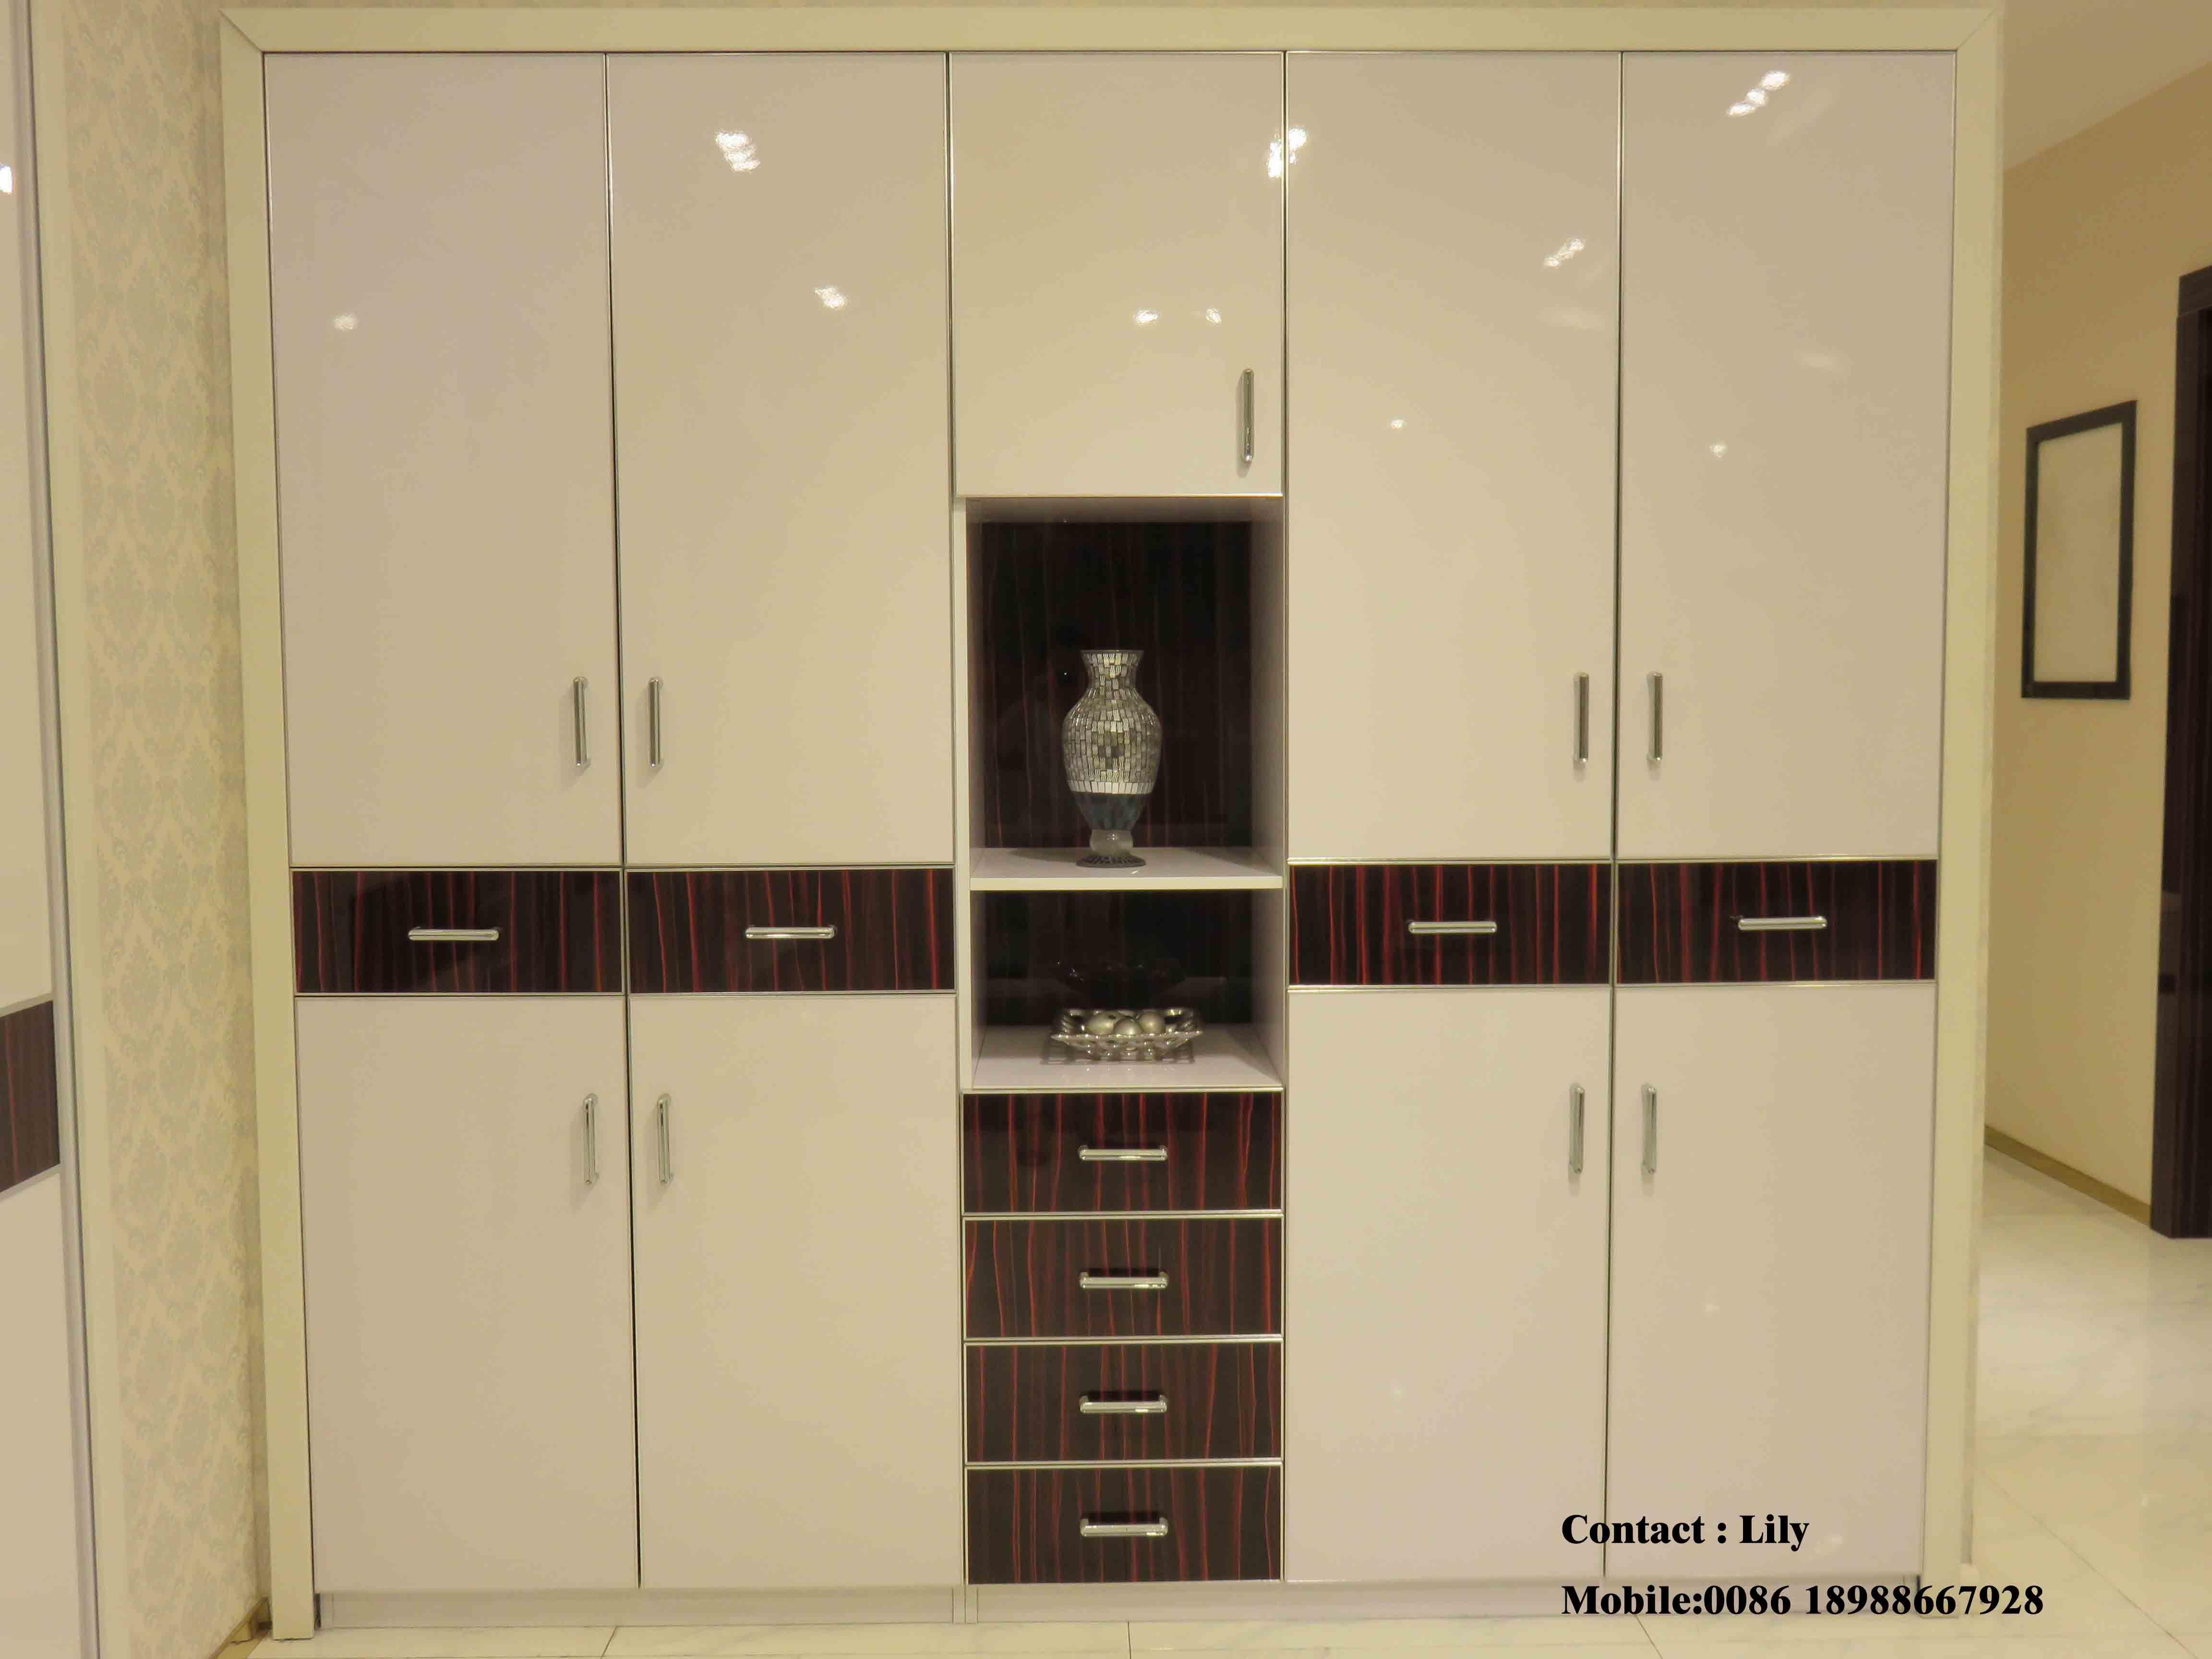 prod product porro in walk wardrobe contemporary modular metal wooden air